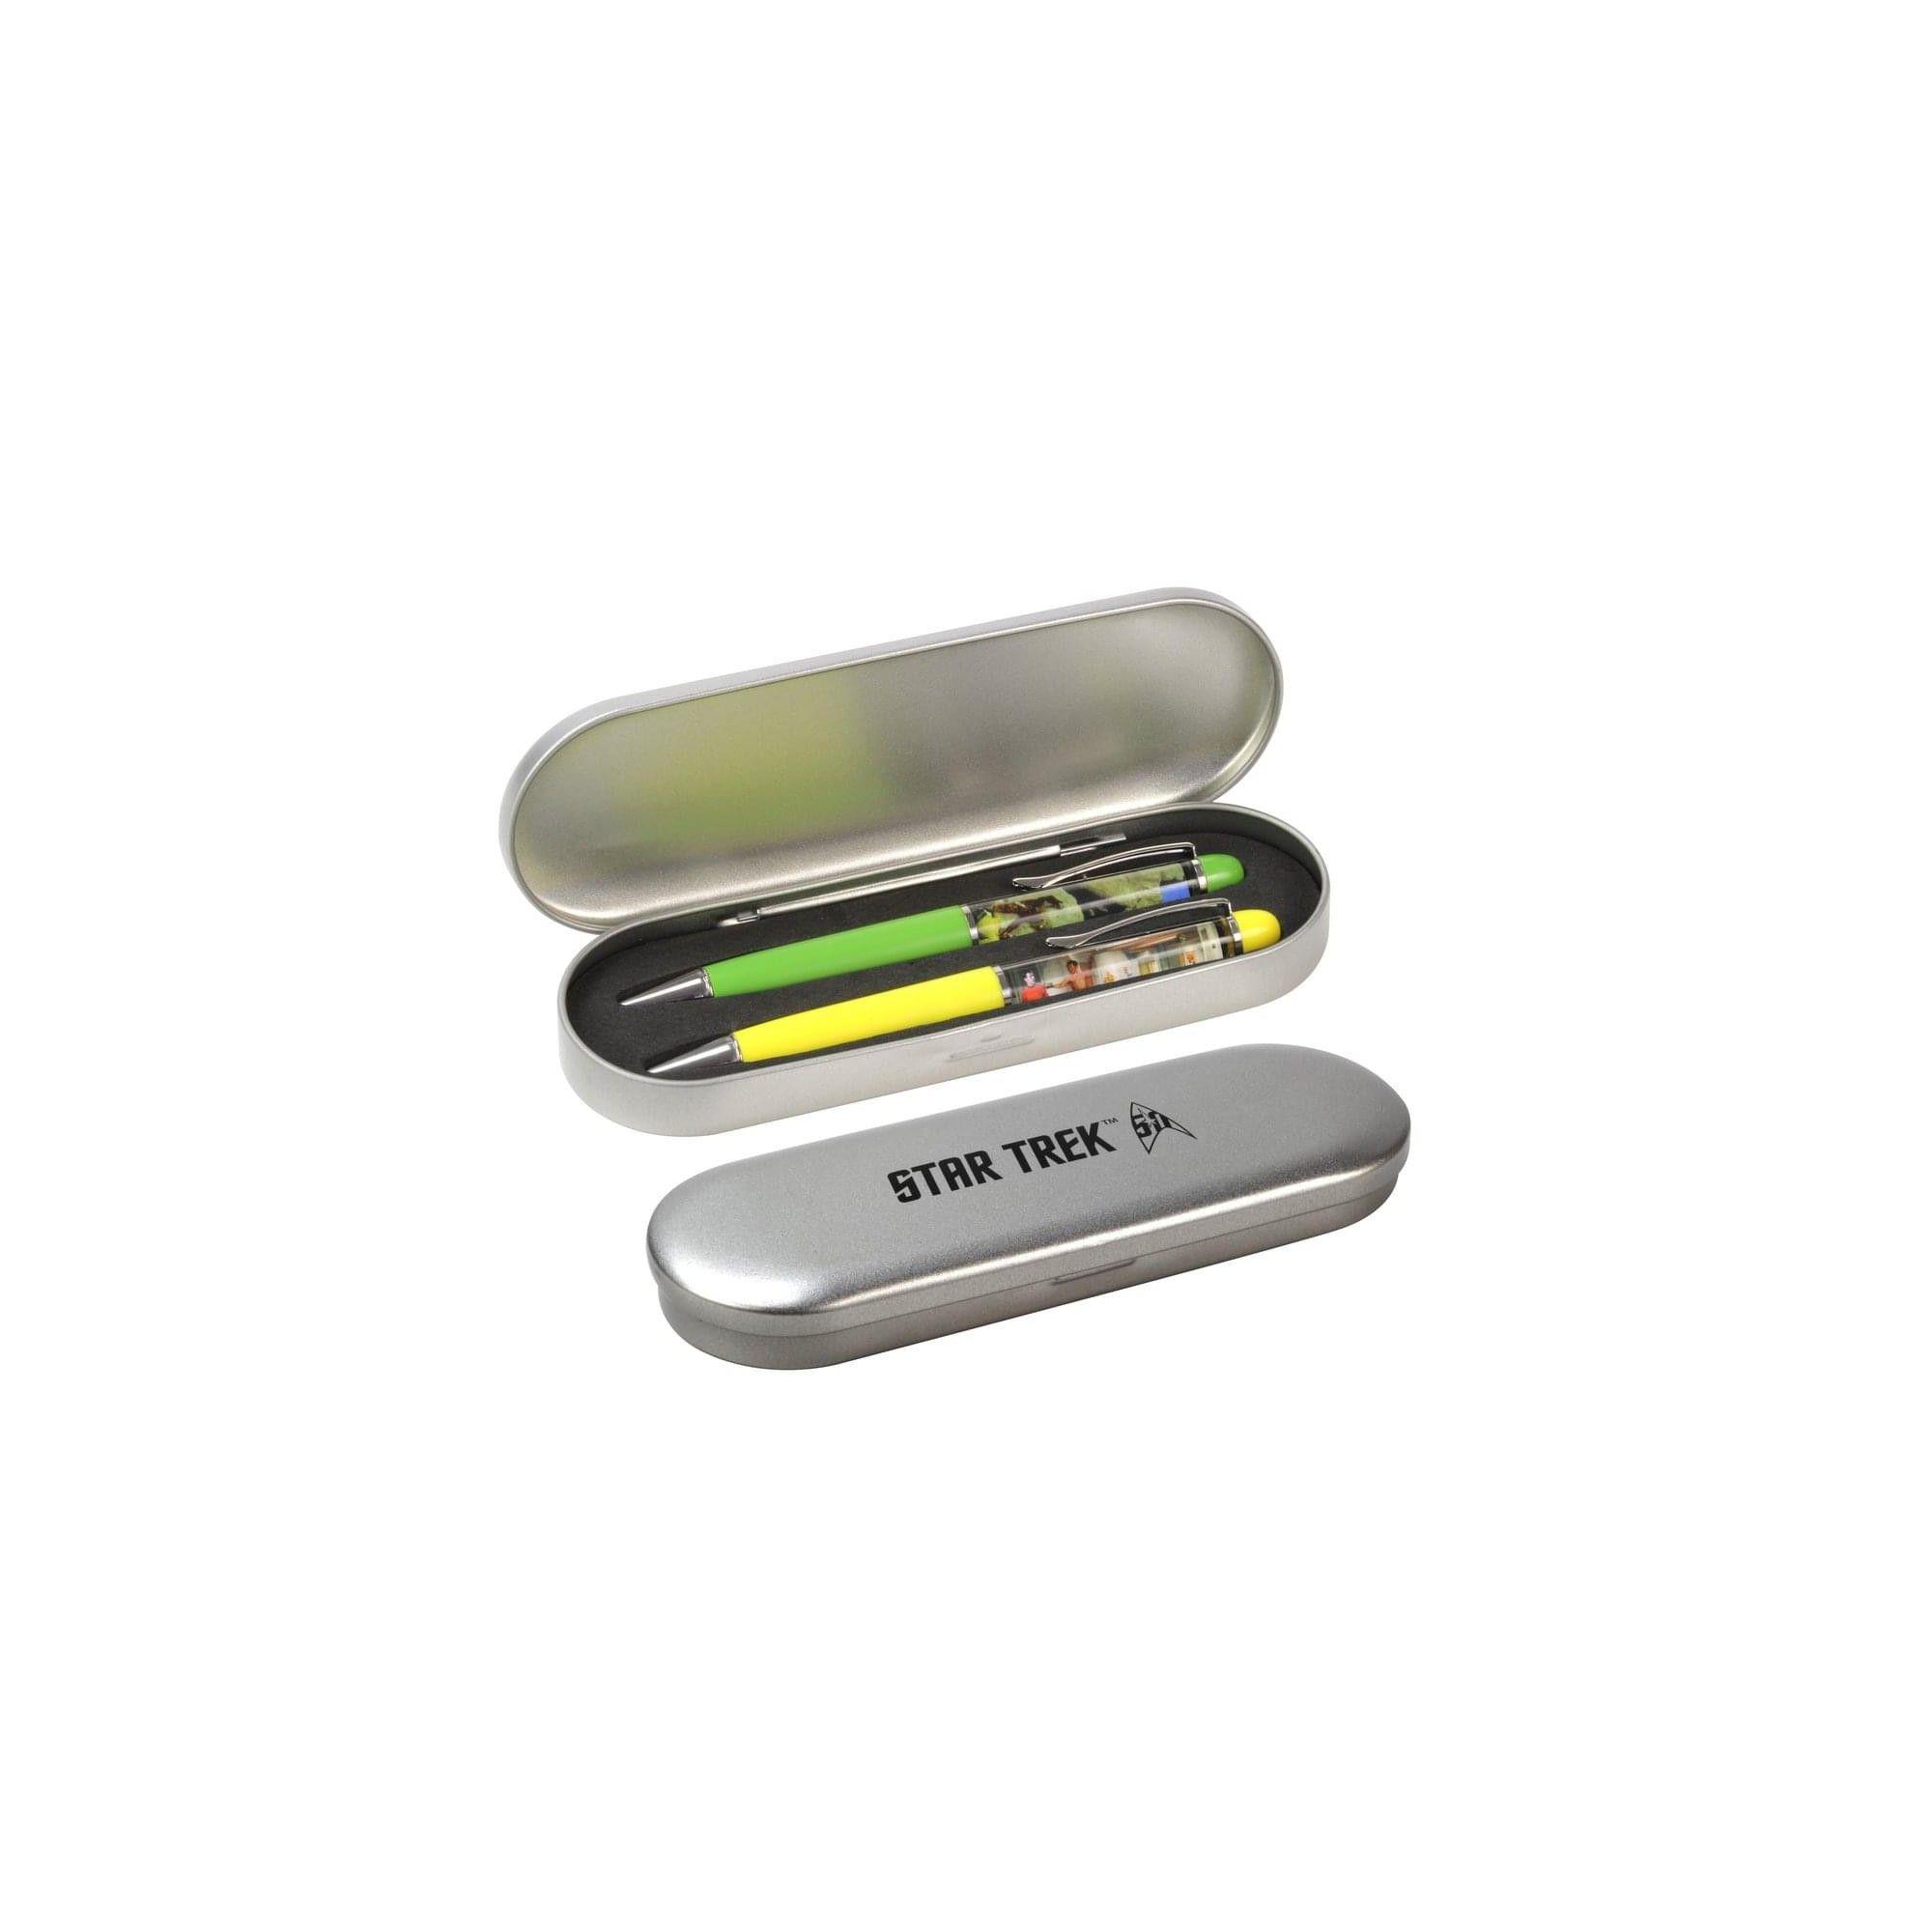 Star Trek Floating Pen Set Swashbuckling Sulu /& Kirk vs Gorn